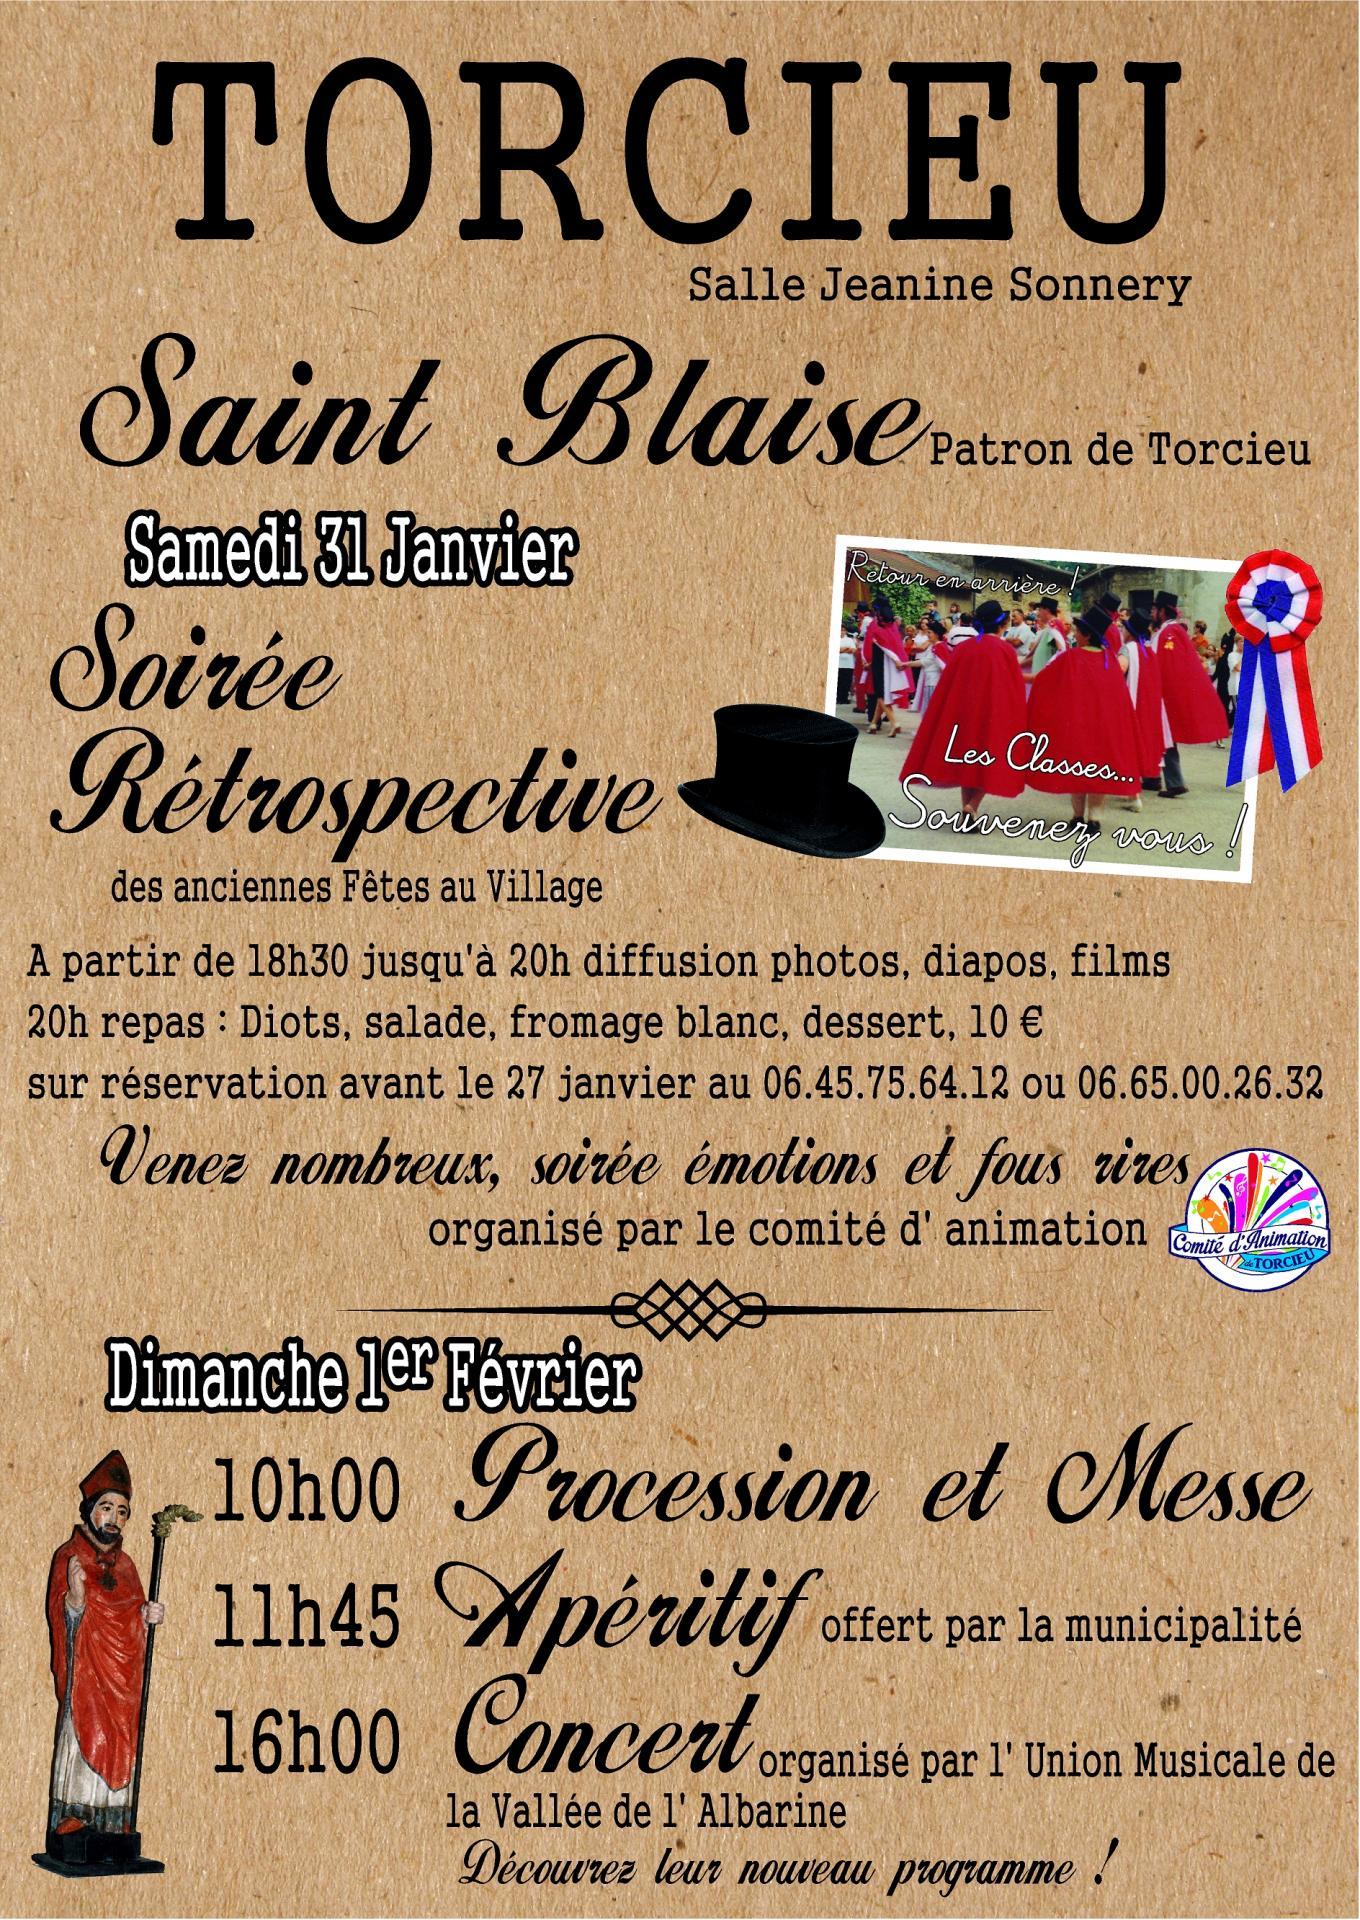 Torcieu st blaise 2015